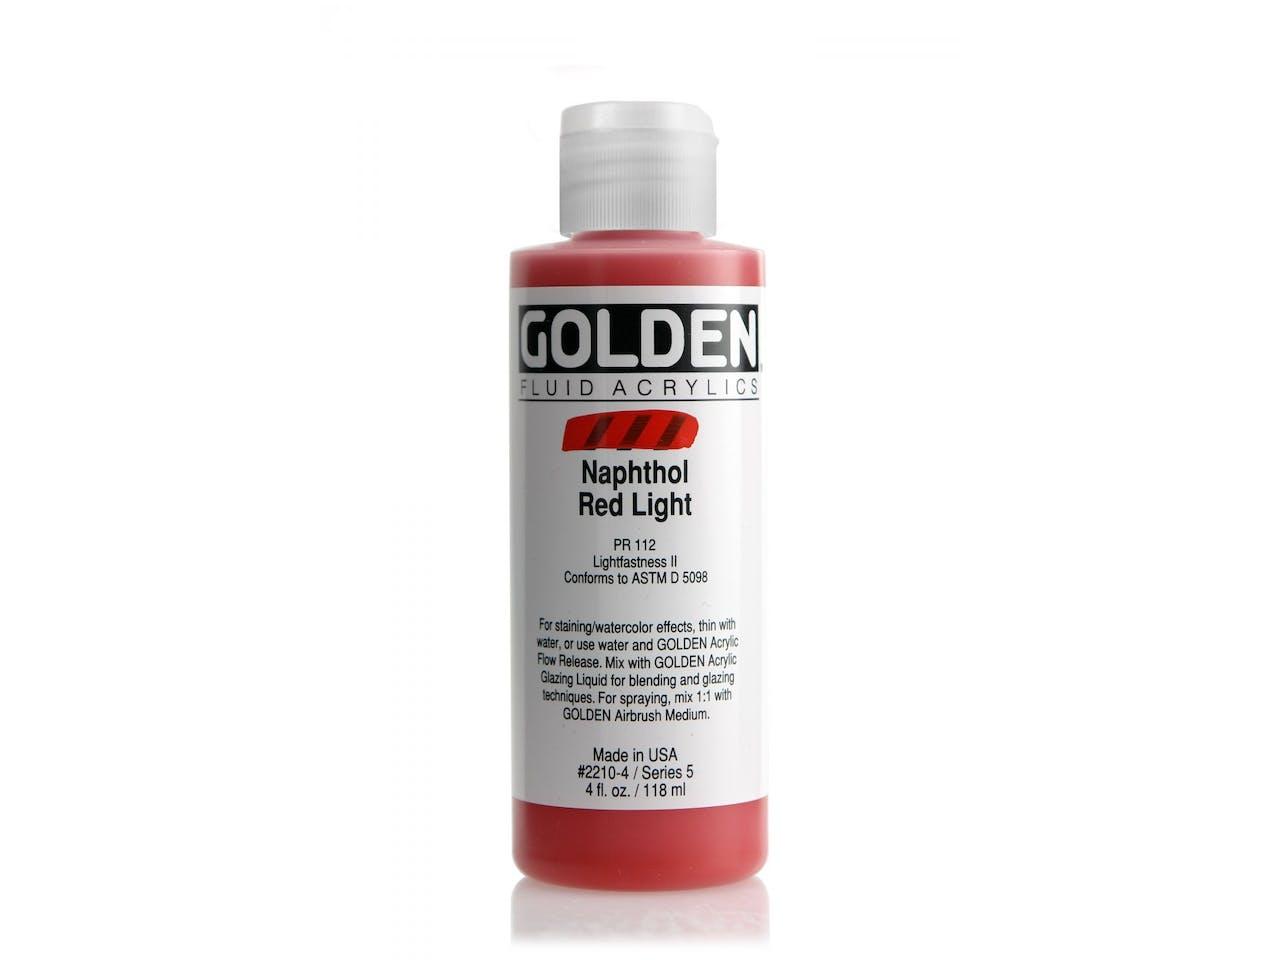 Golden Acrylfarbe Fluid, Flasche 118 ml, Naphthol Red Light (2210)